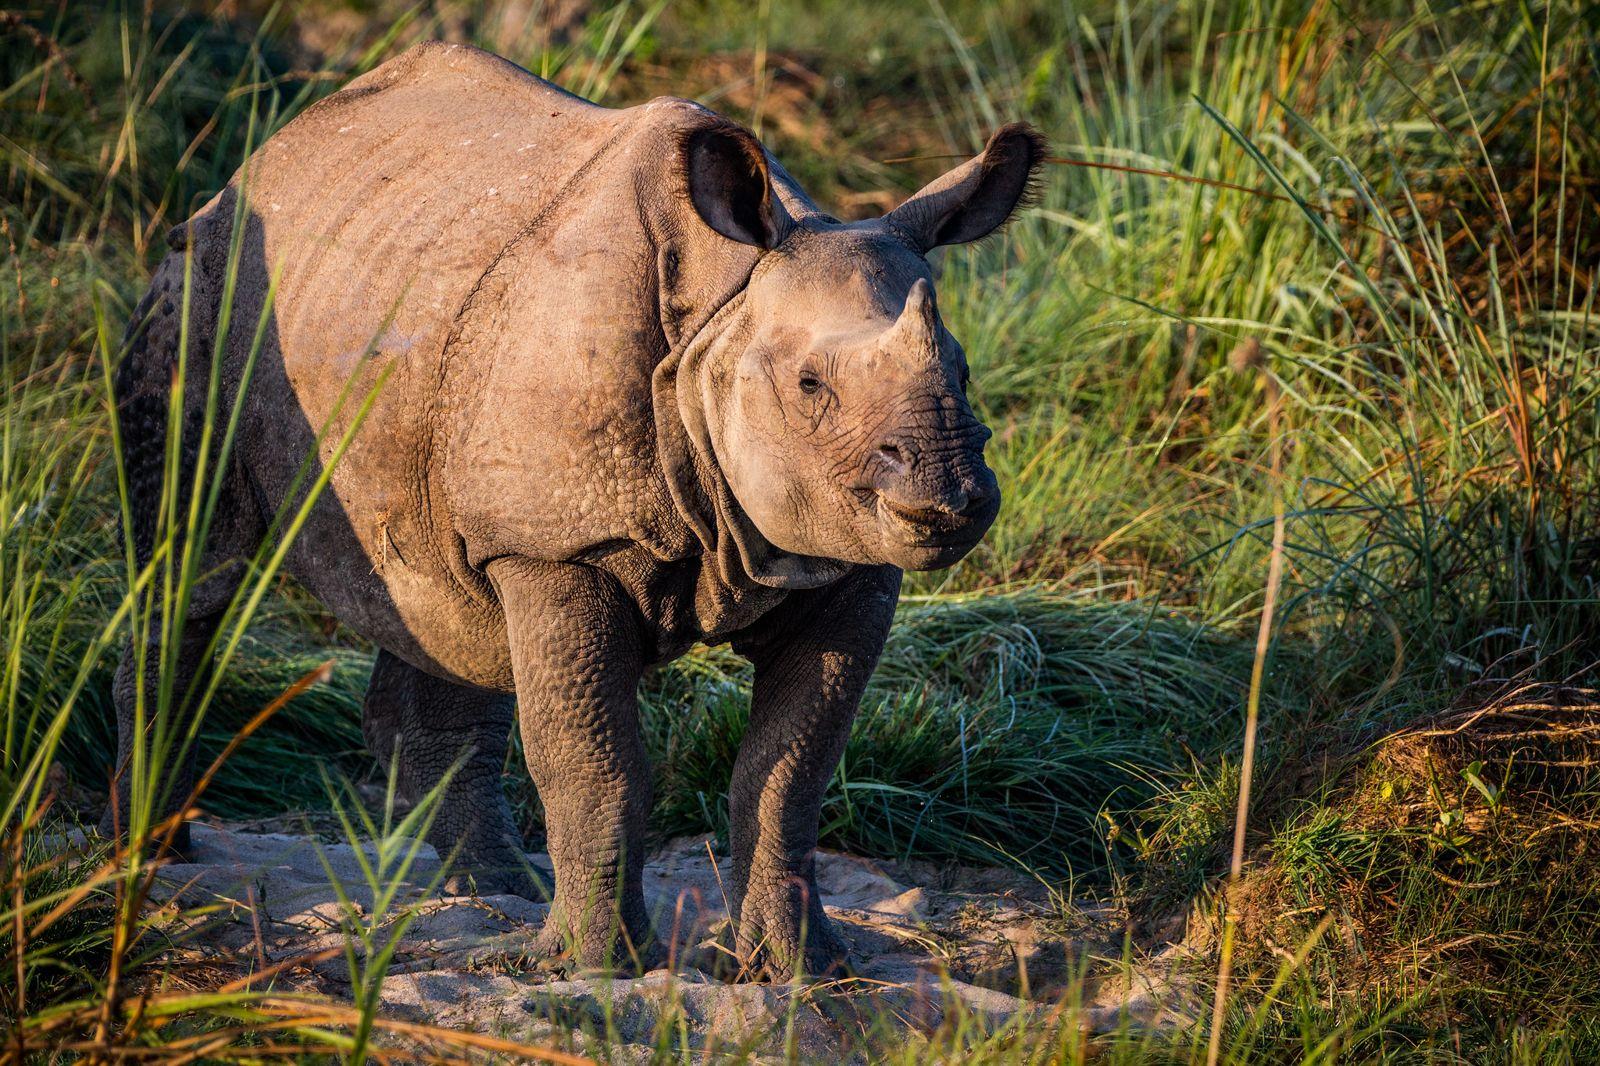 One horned rhino in Nepal